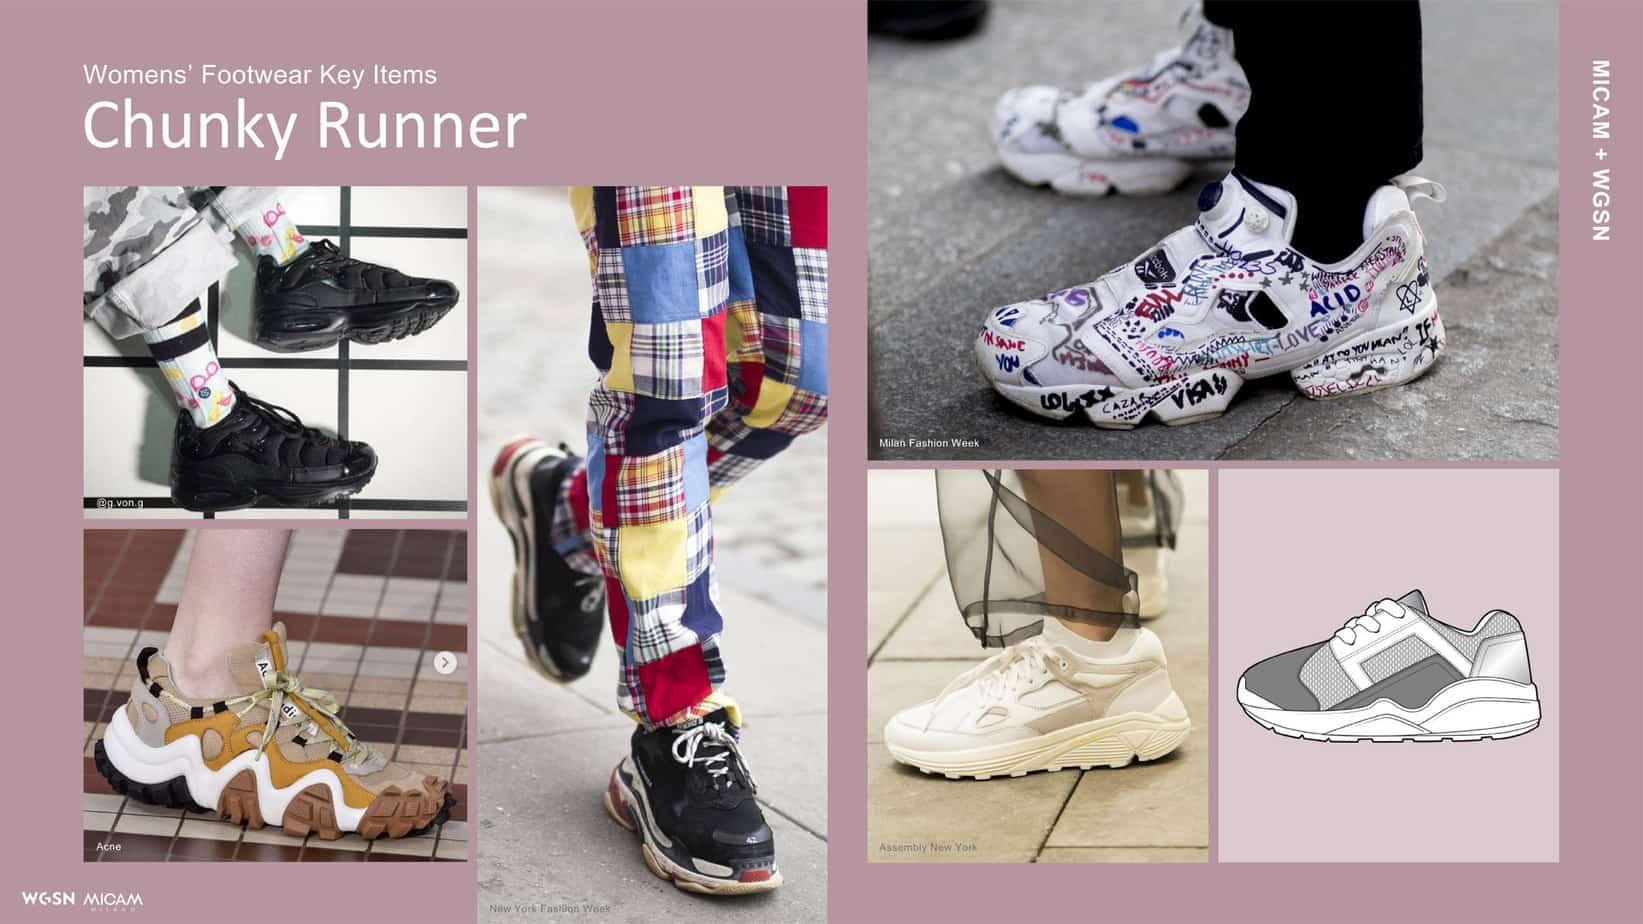 Womens' Footwear Key Items Chunky Runner